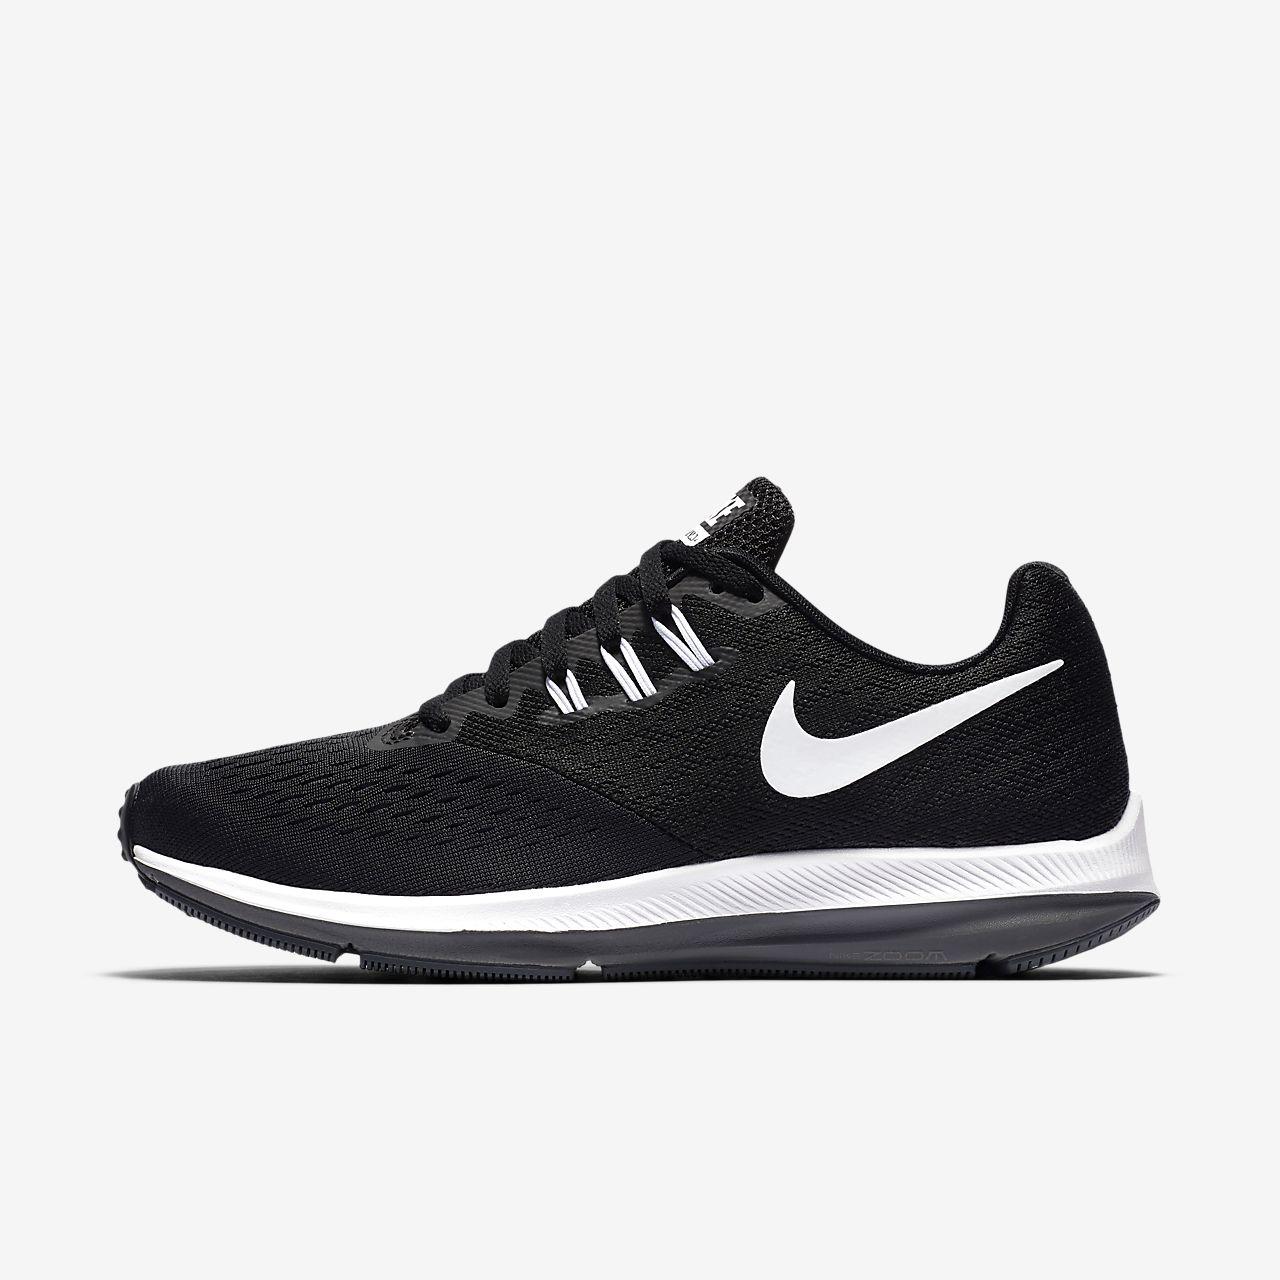 893c14e23f343 Nike Zoom Winflo 4 Zapatillas de running - Mujer. Nike.com ES